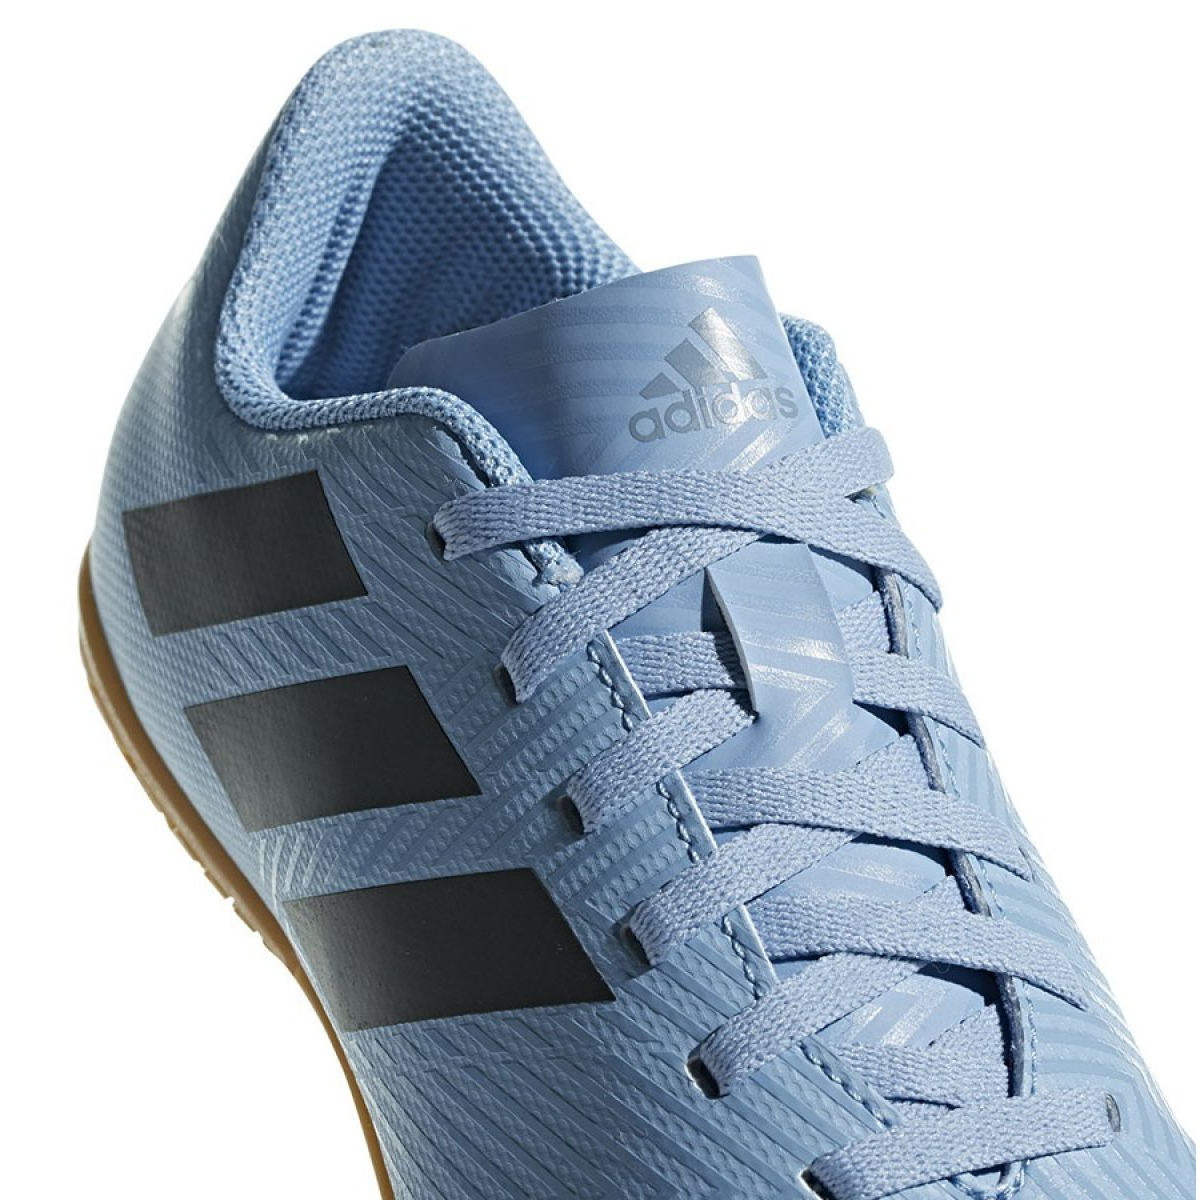 b18a3cdcc9734 Adidas Nemeziz Messi Tango In Jr DB2397 Indoor-Schuhe - ButyModne.pl